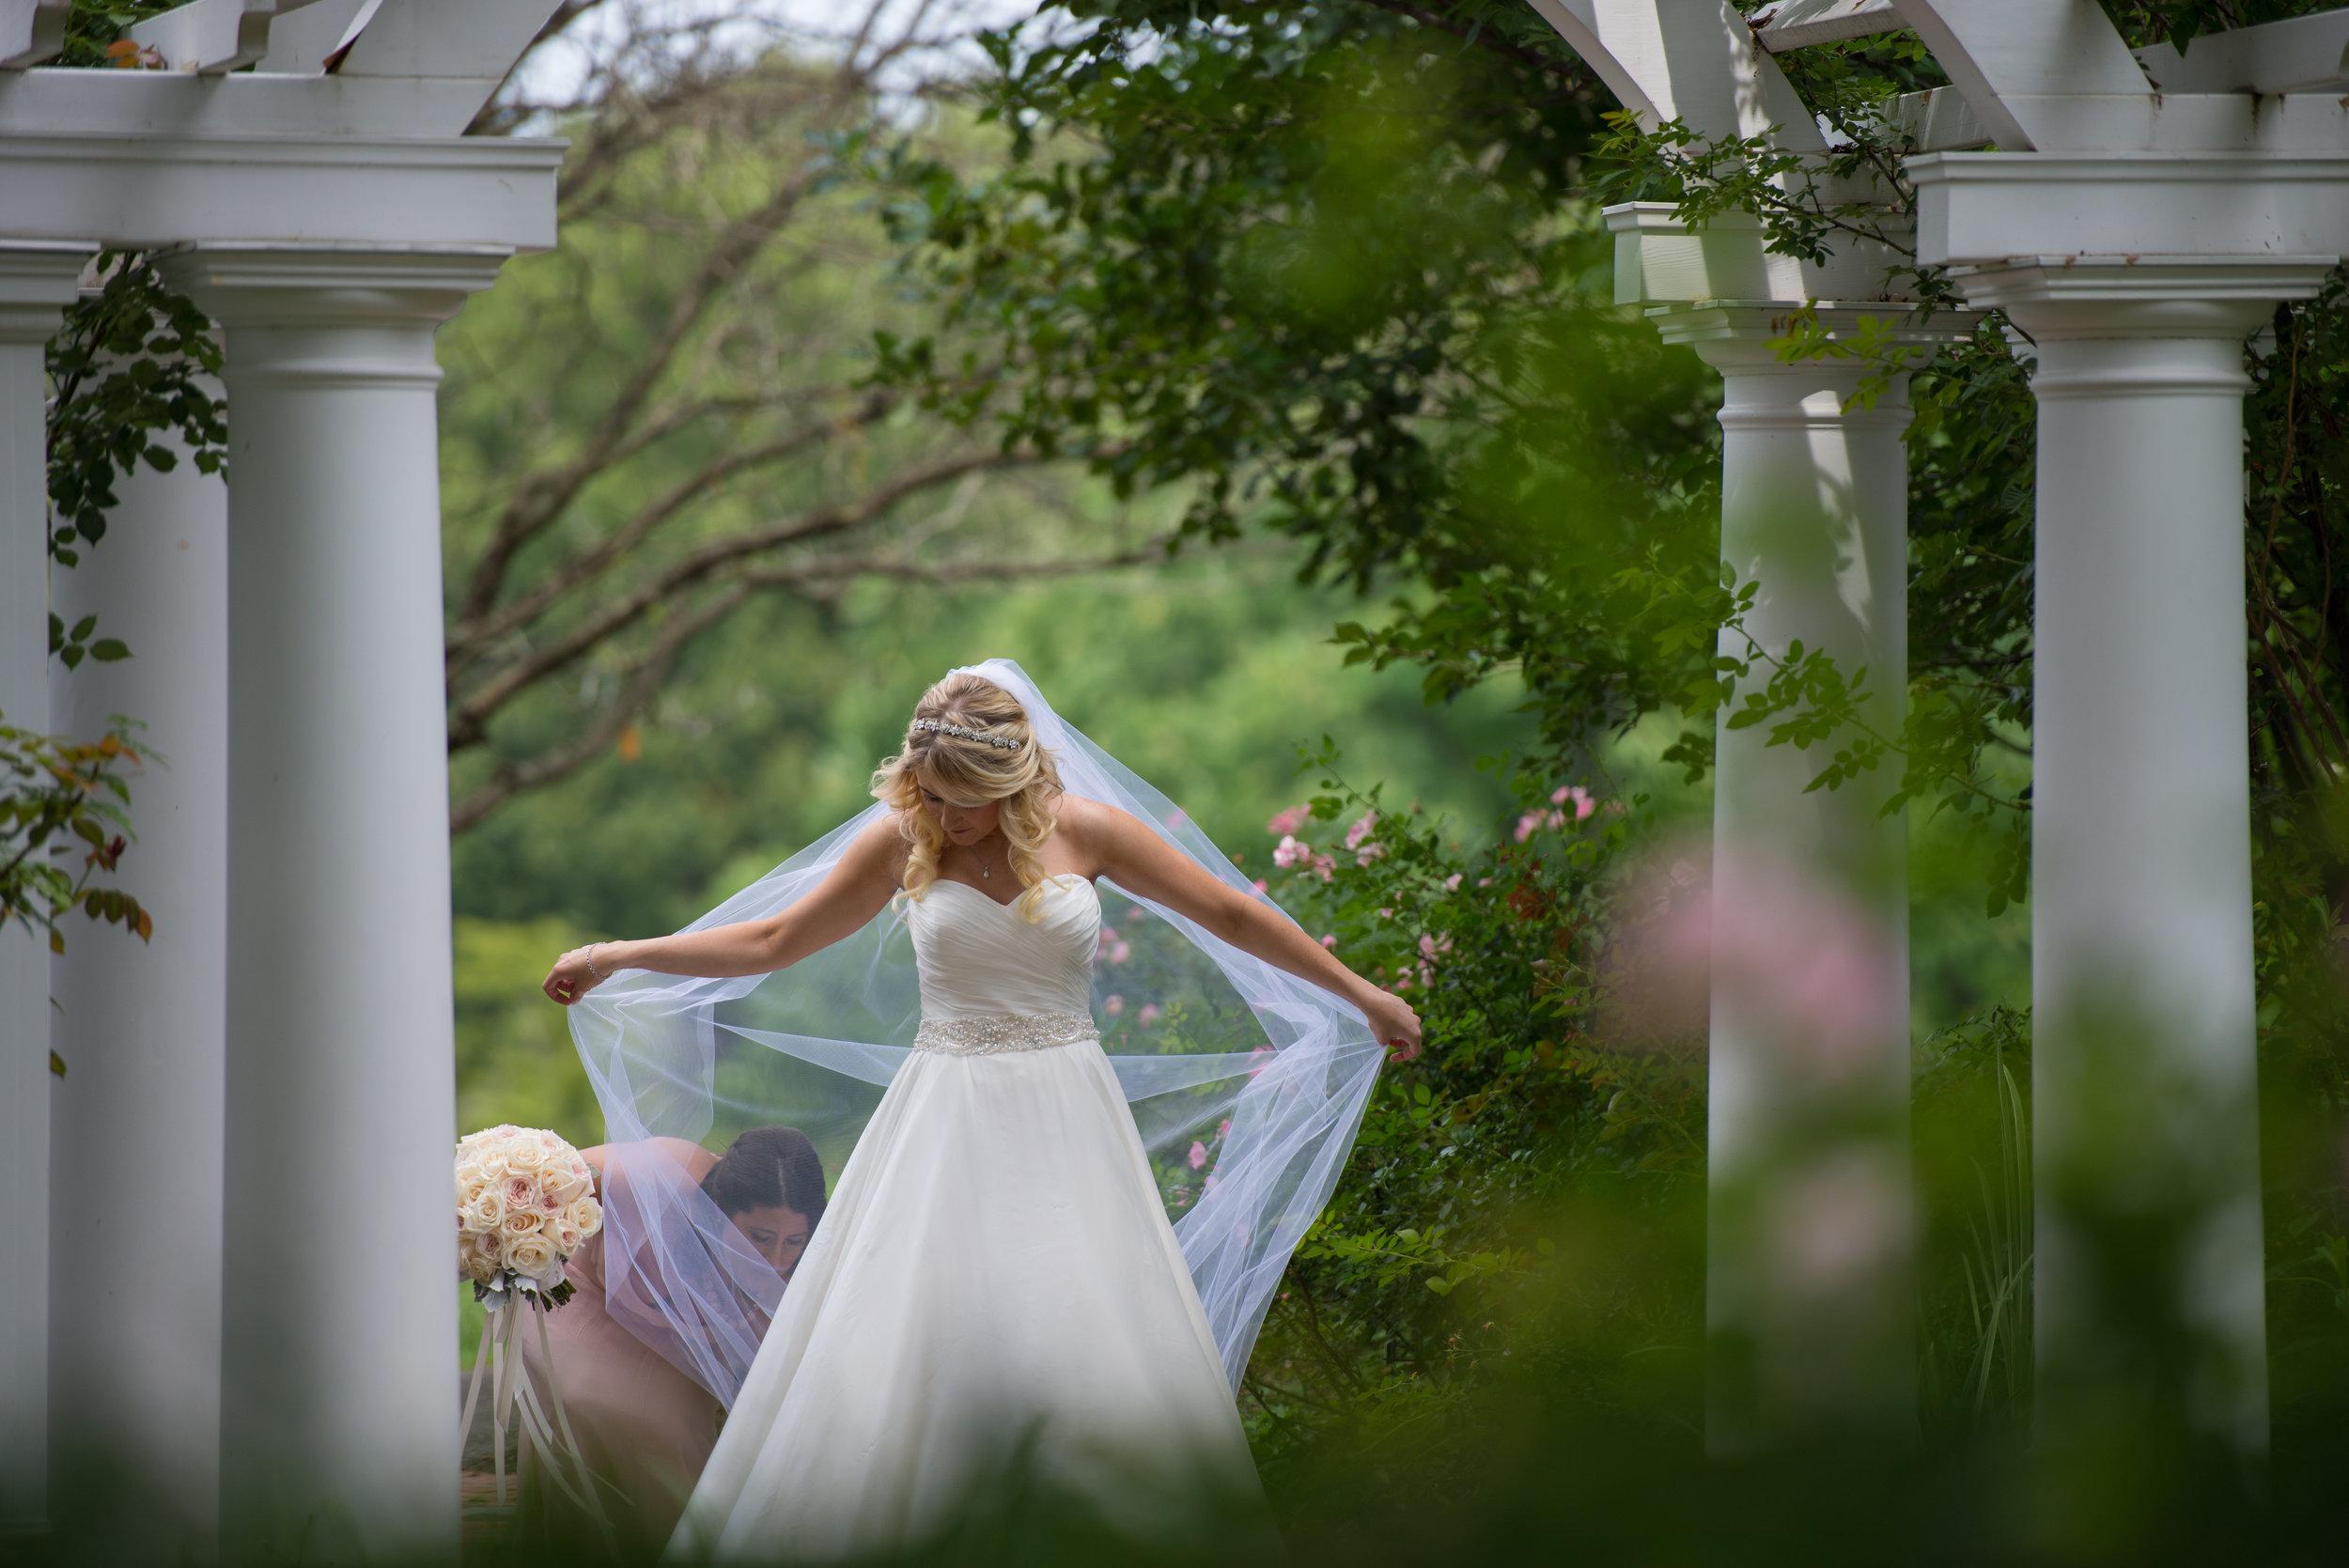 Wedding First Look Photos00903.jpg